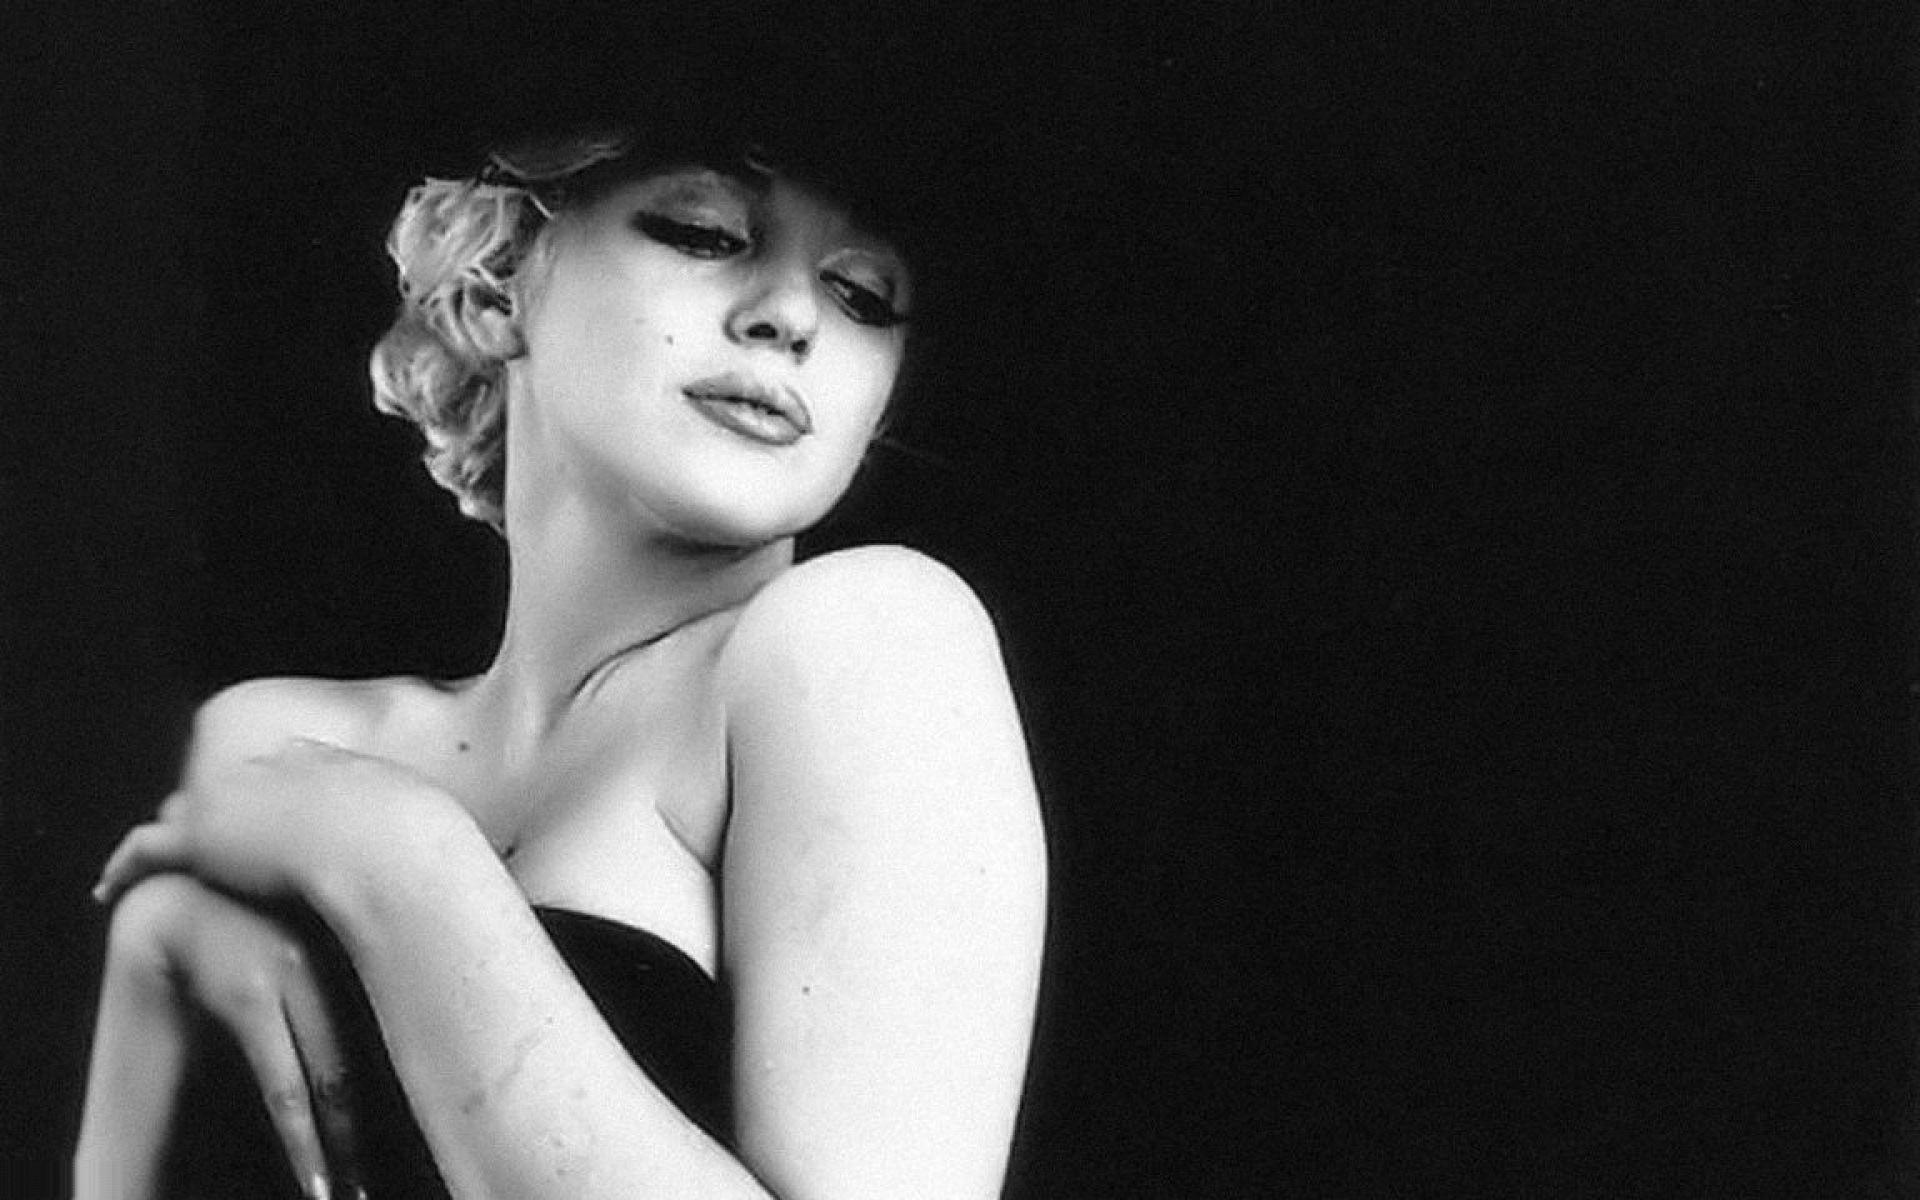 Marilyn Monroe Hd Wallpaper Marilyn Monroe Pho Home Design